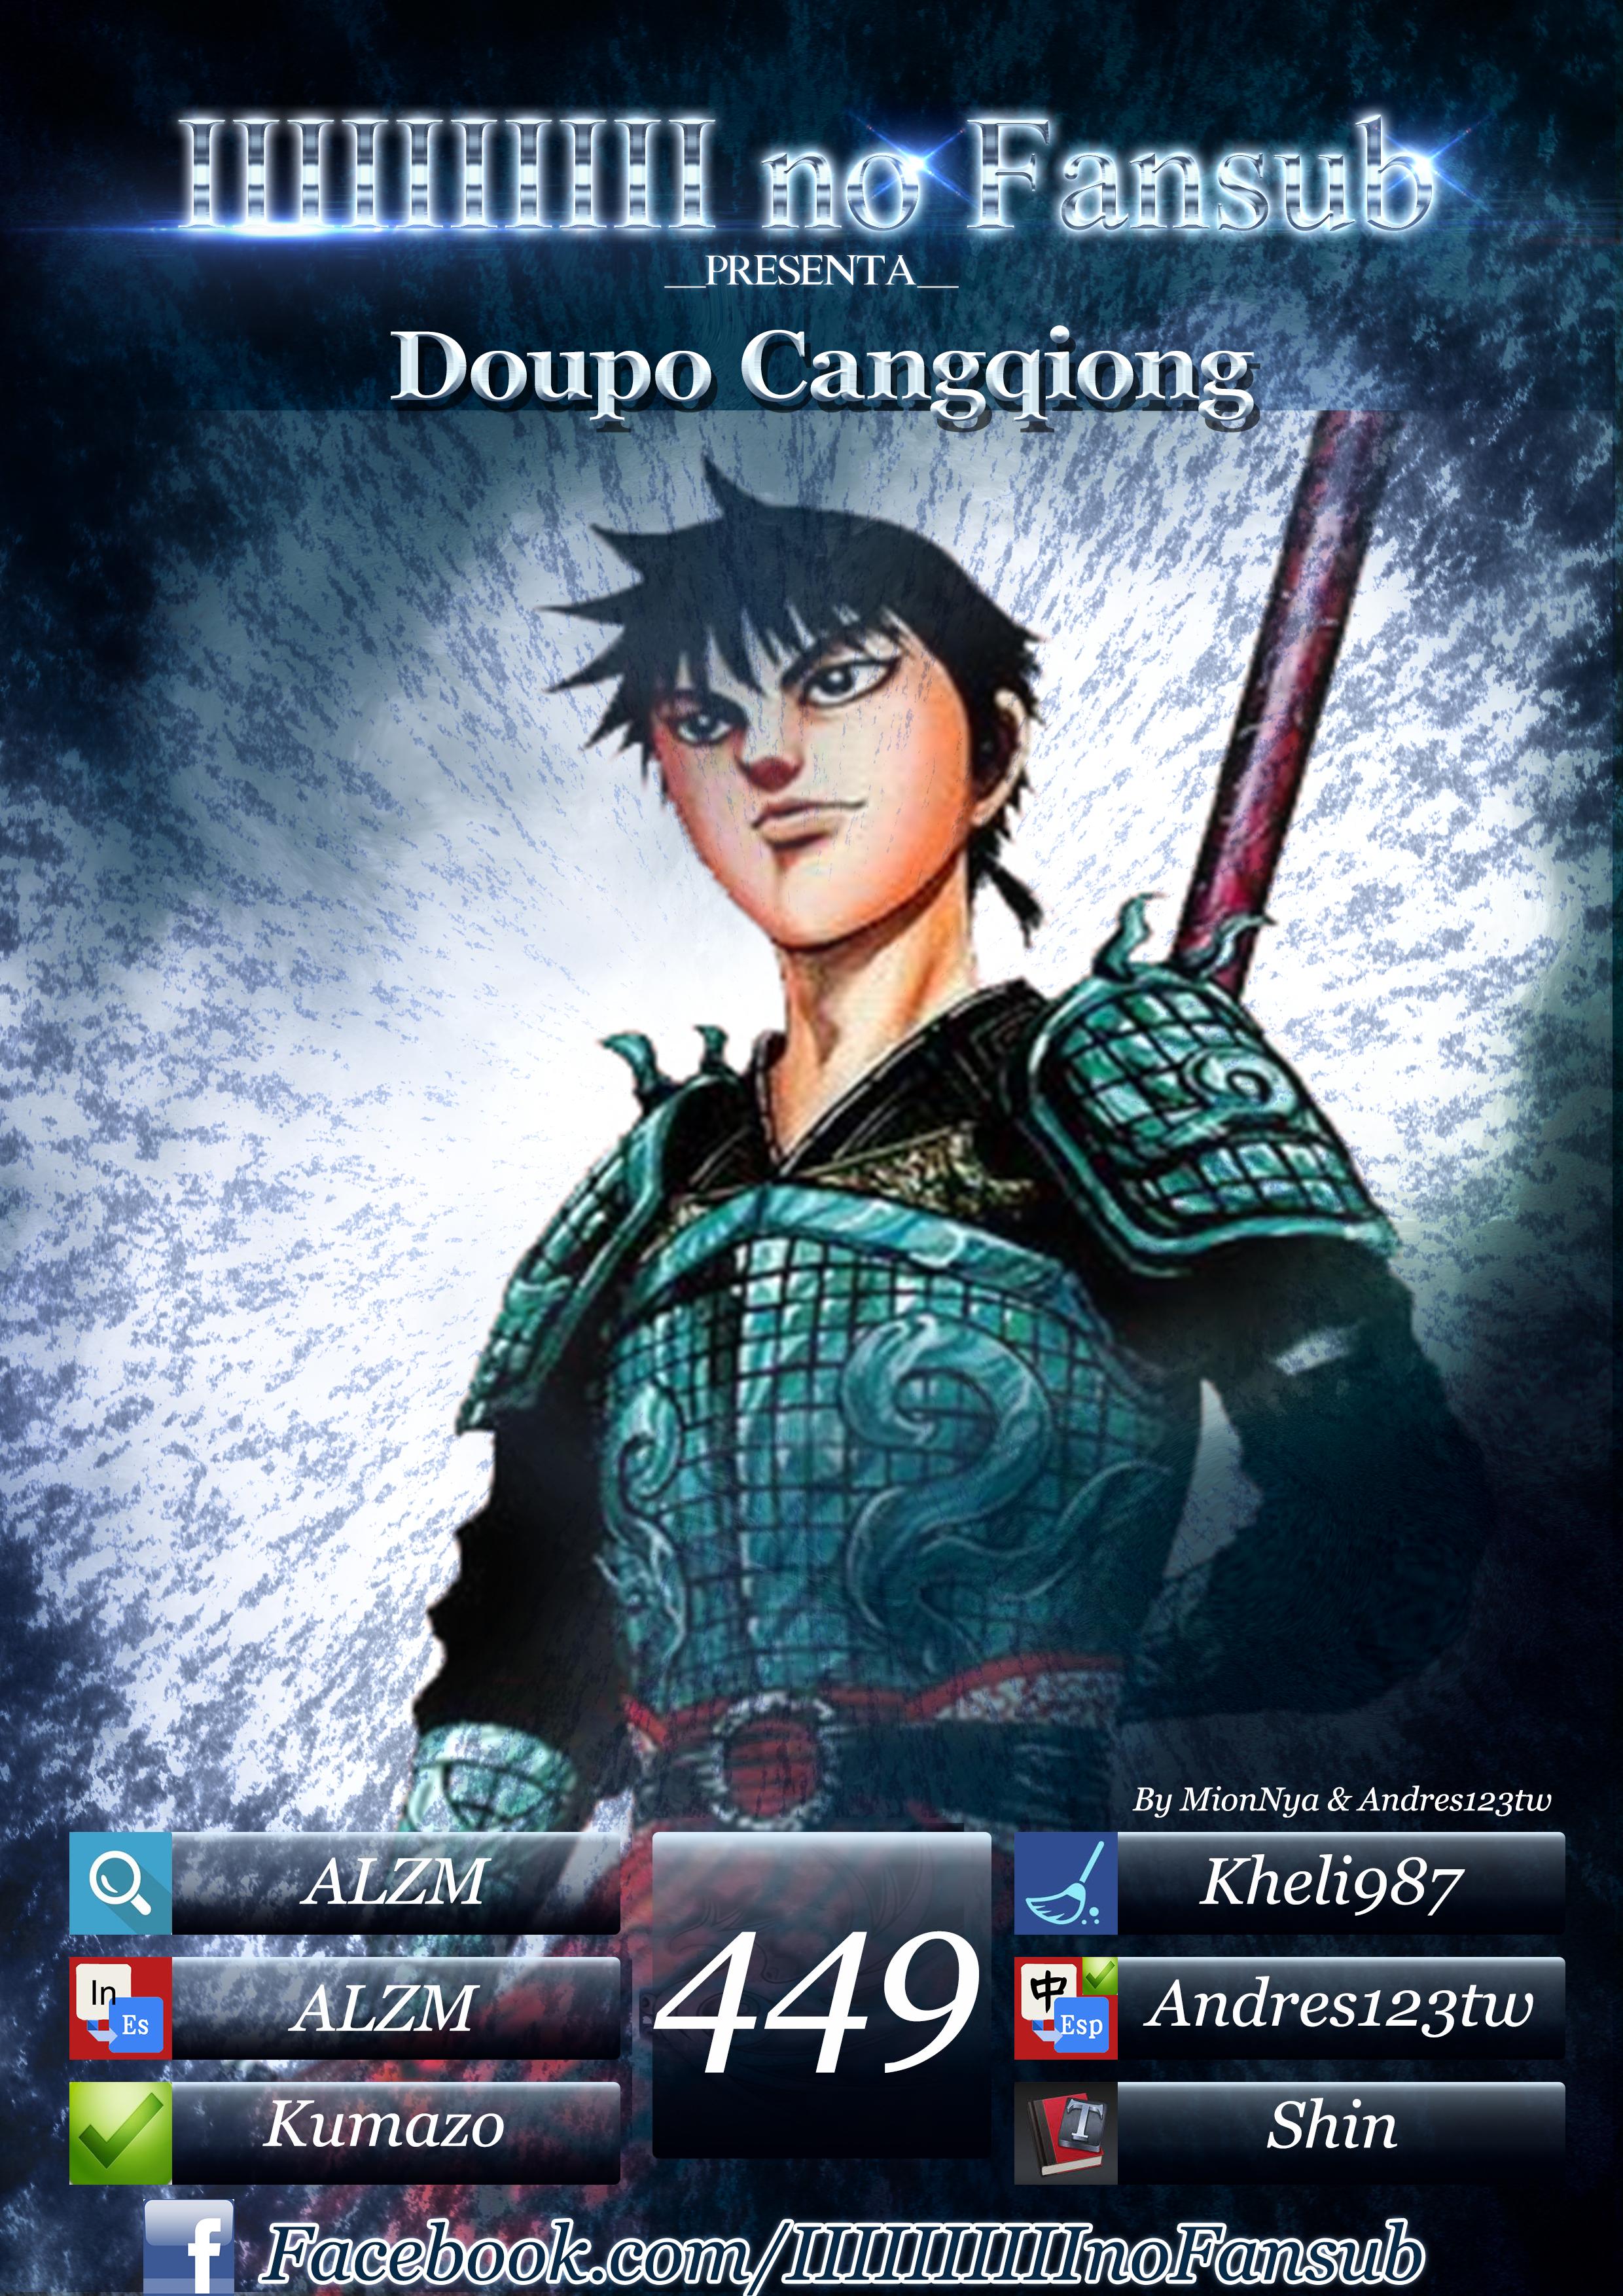 http://c5.ninemanga.com/es_manga/19/12307/420277/21b6b8d60c4524c0aeb0afb5a507a8c1.jpg Page 1